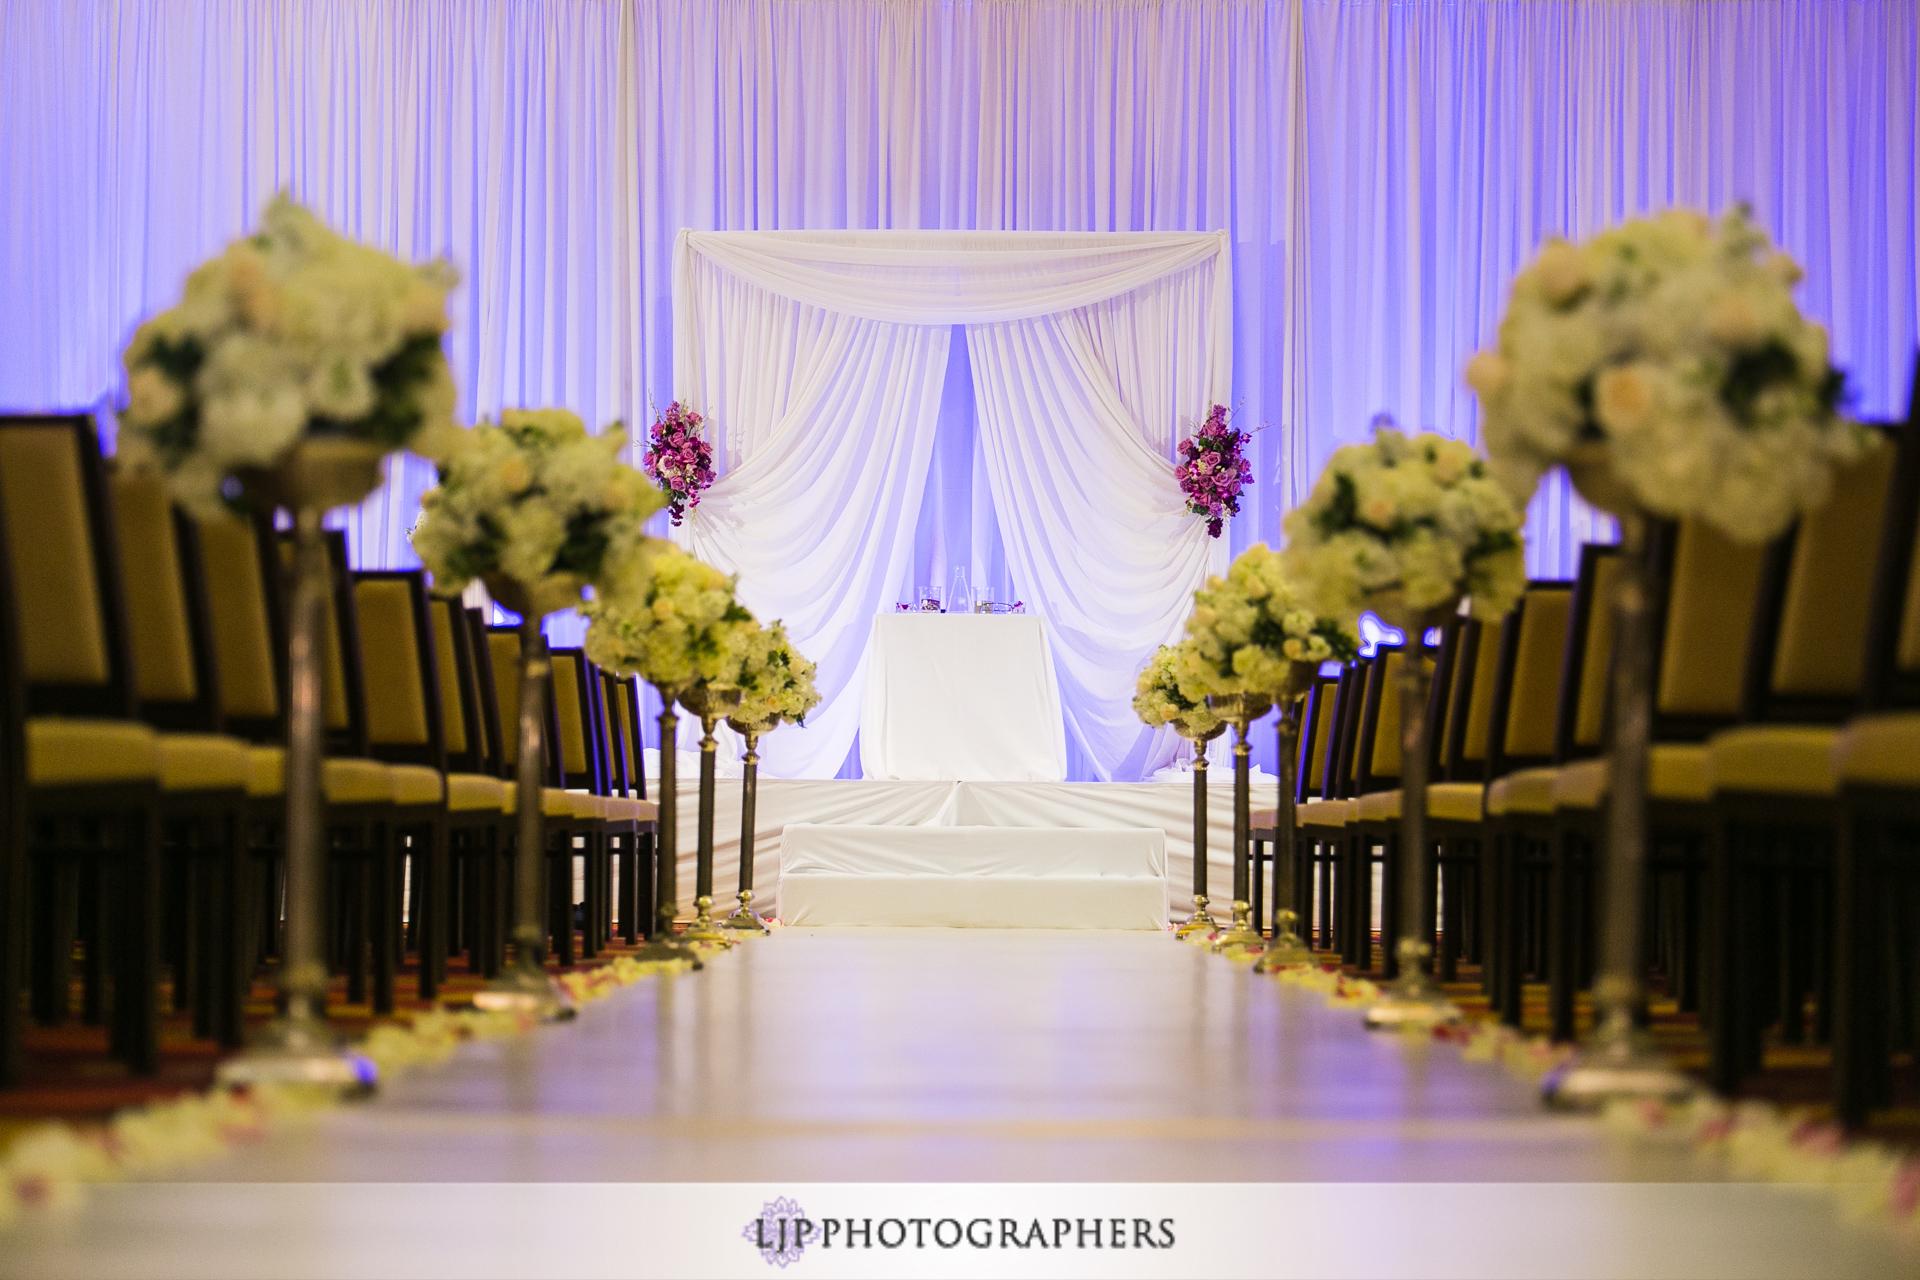 14-jw-marriott-los-angeles-wedding-photographer-wedding-ceremony-photos